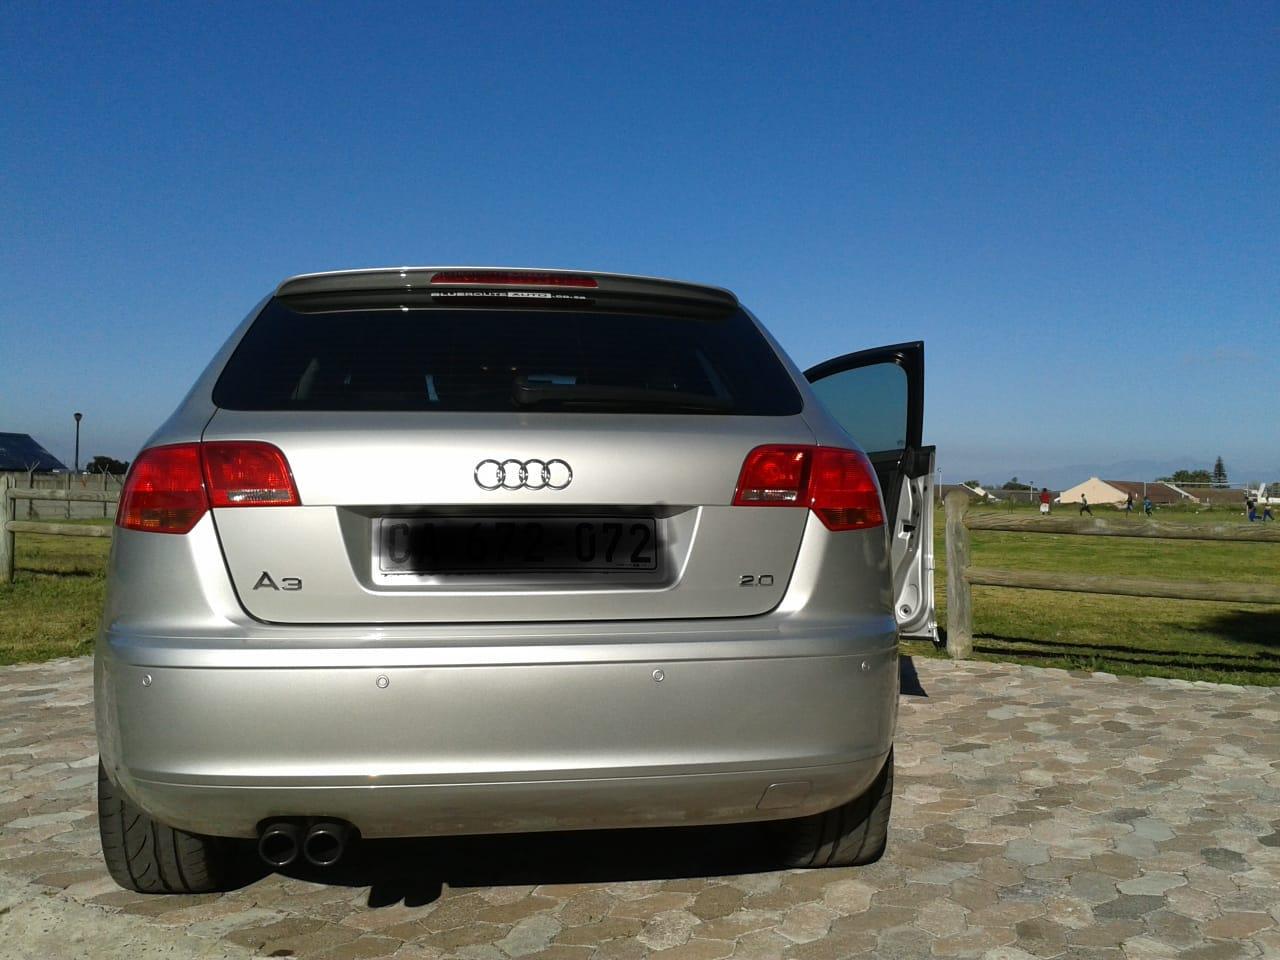 2008 Audi A3 Sportback 2.0 Ambition